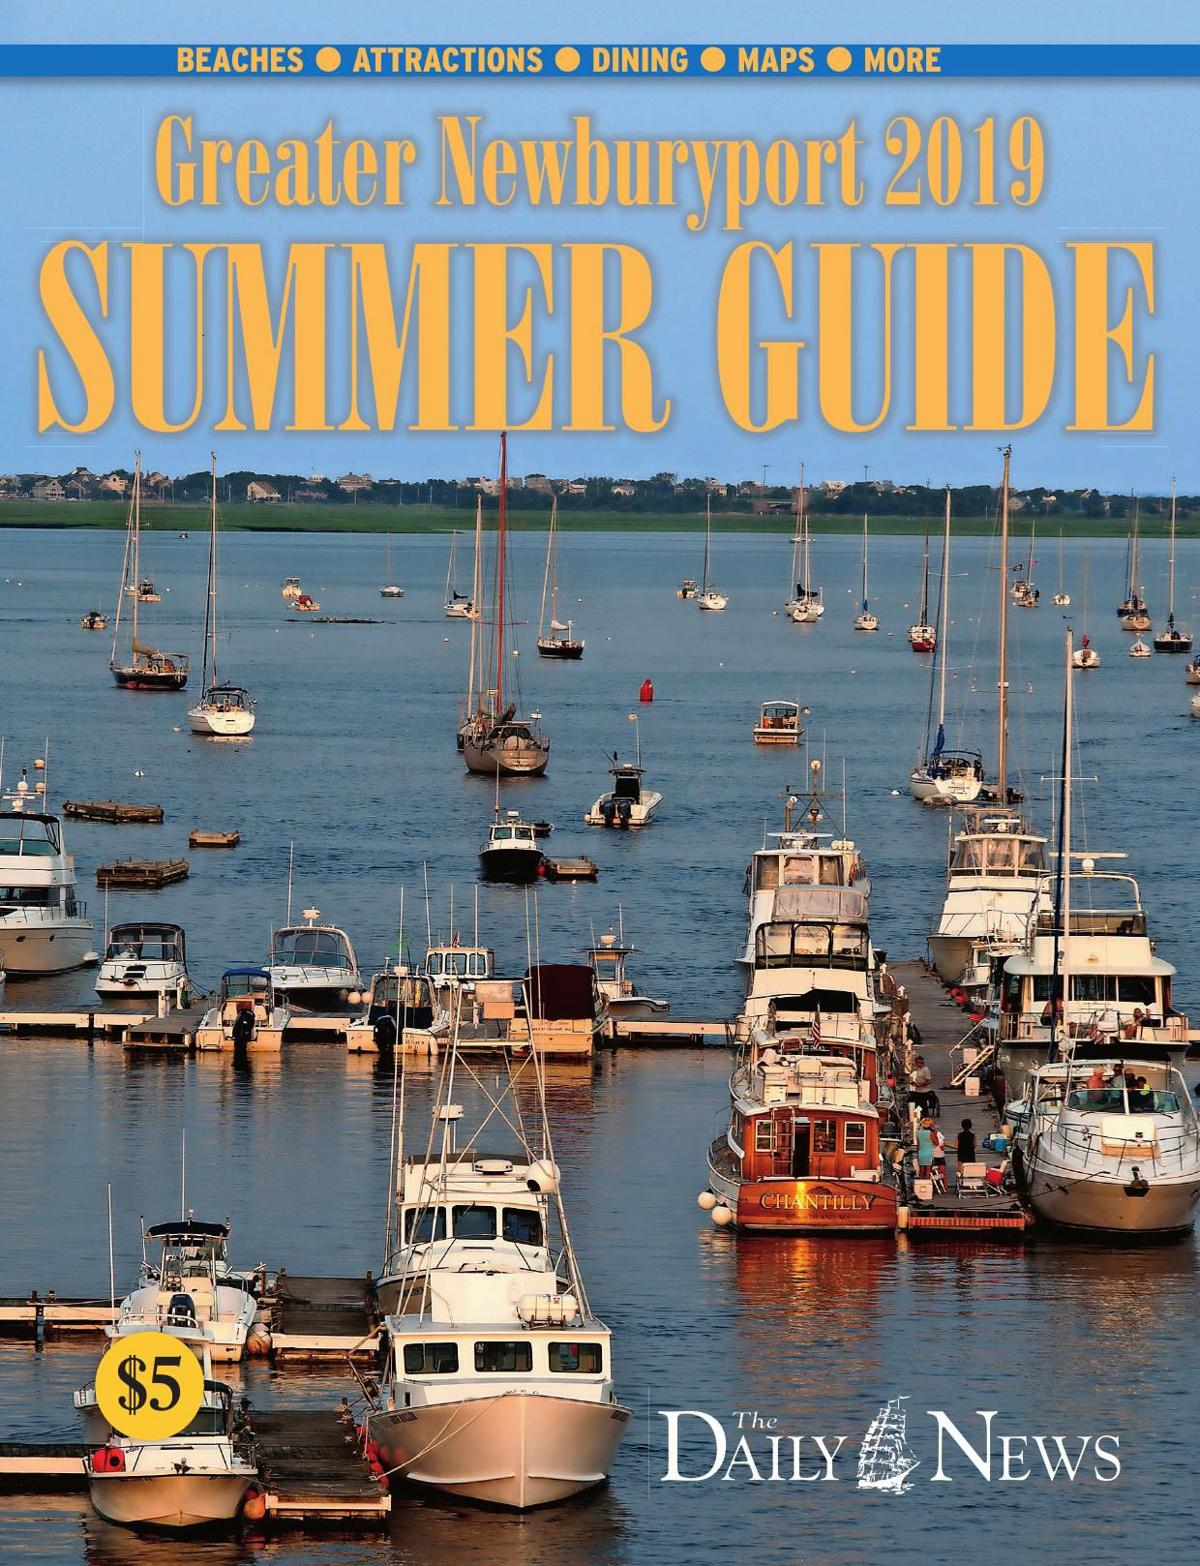 Greater Newburyport Summer Guide 2019